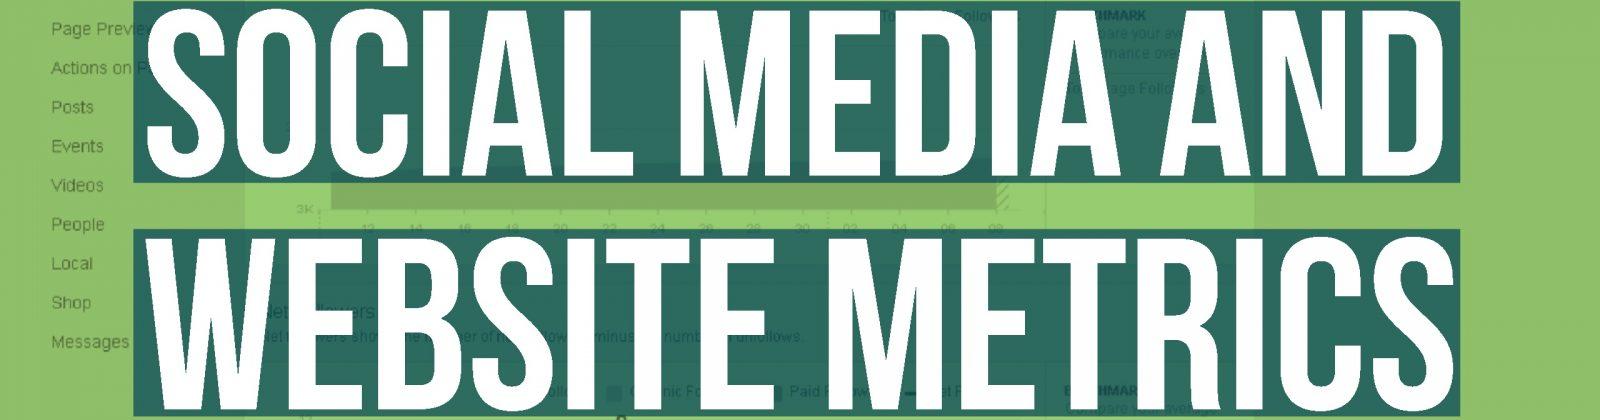 Social Media and Website Metrics